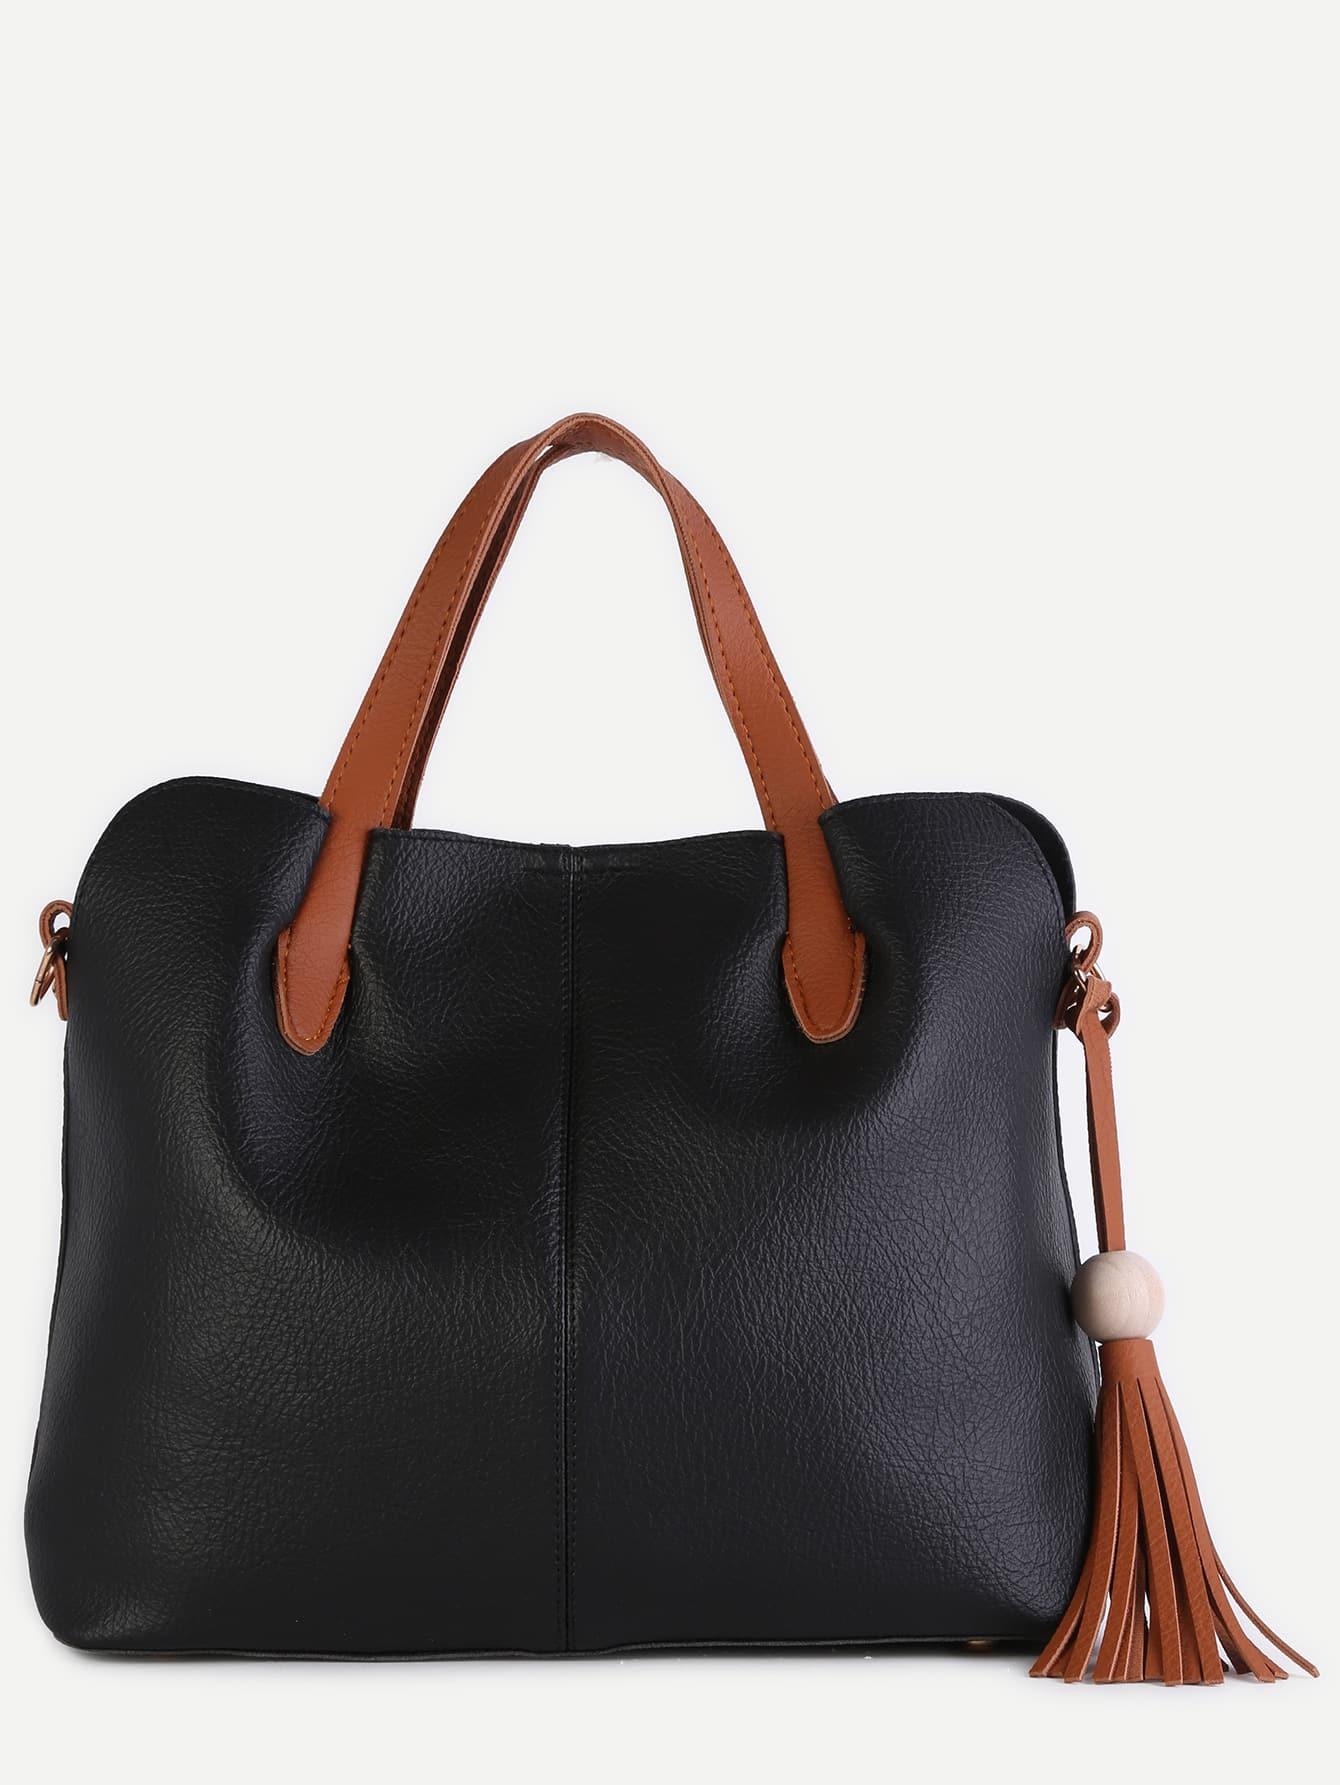 bag161010907_2